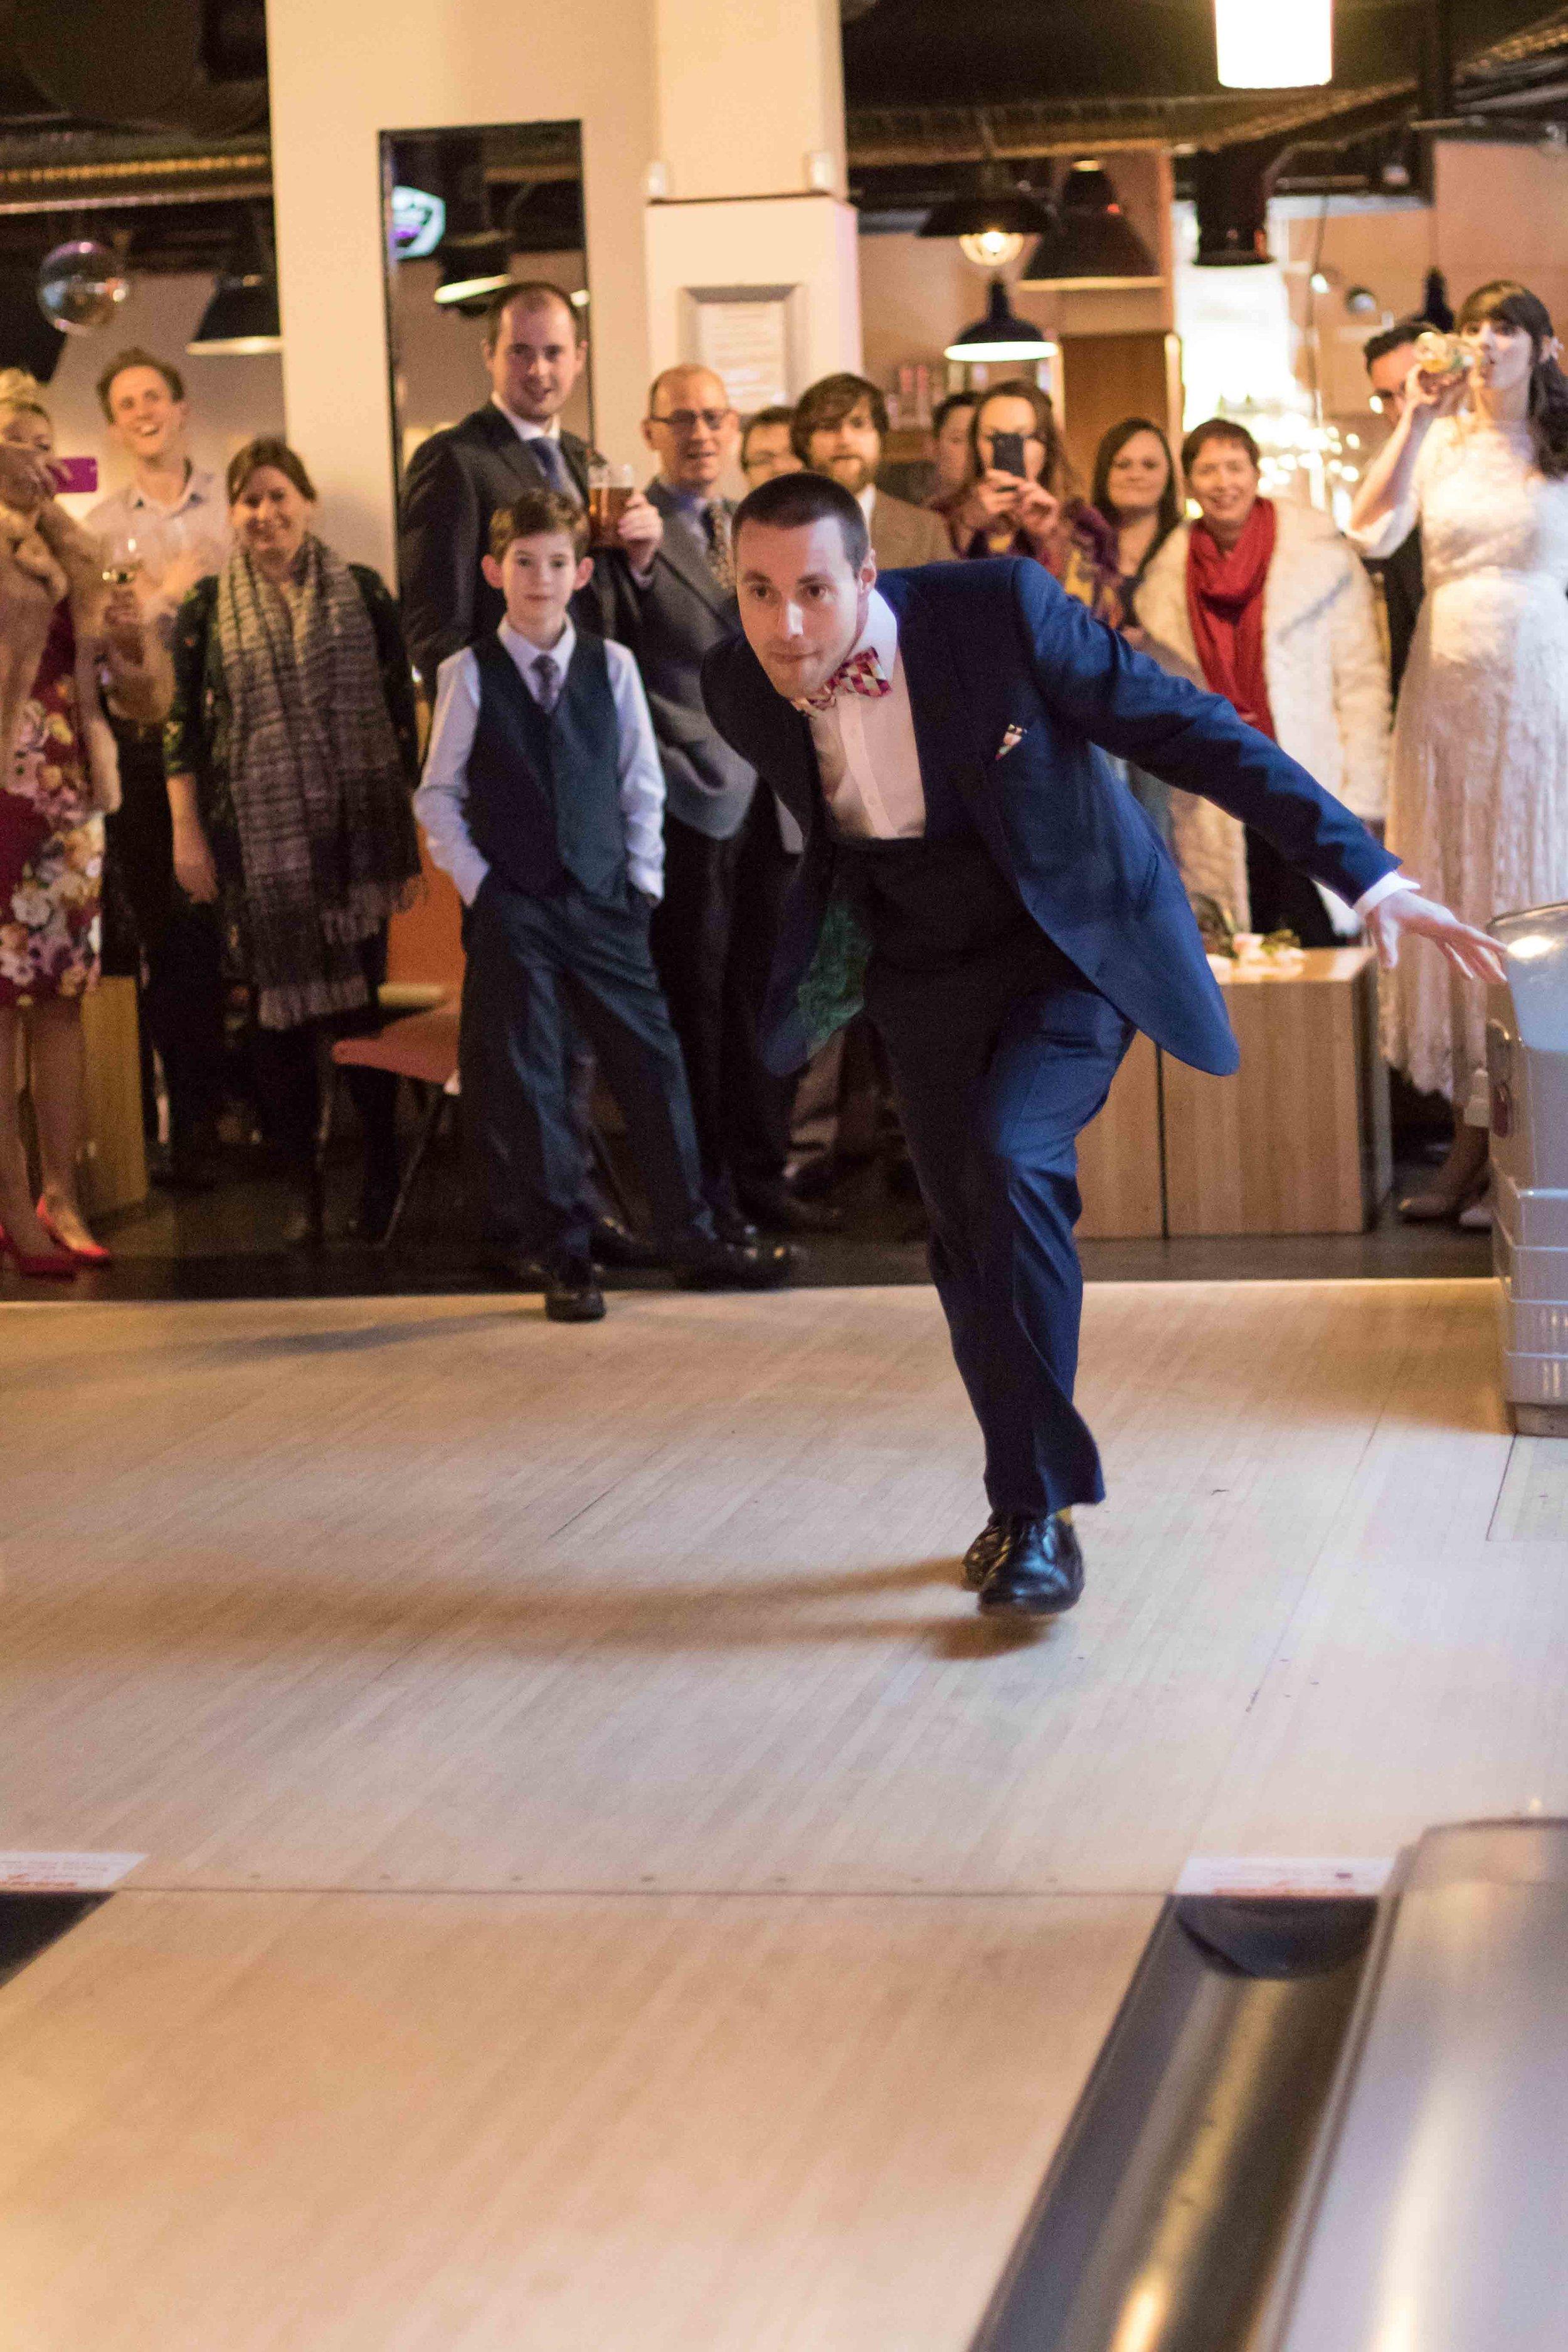 Adam & Faye - Wright Wedding Photography - Bristol Wedding Photographer -355.jpg